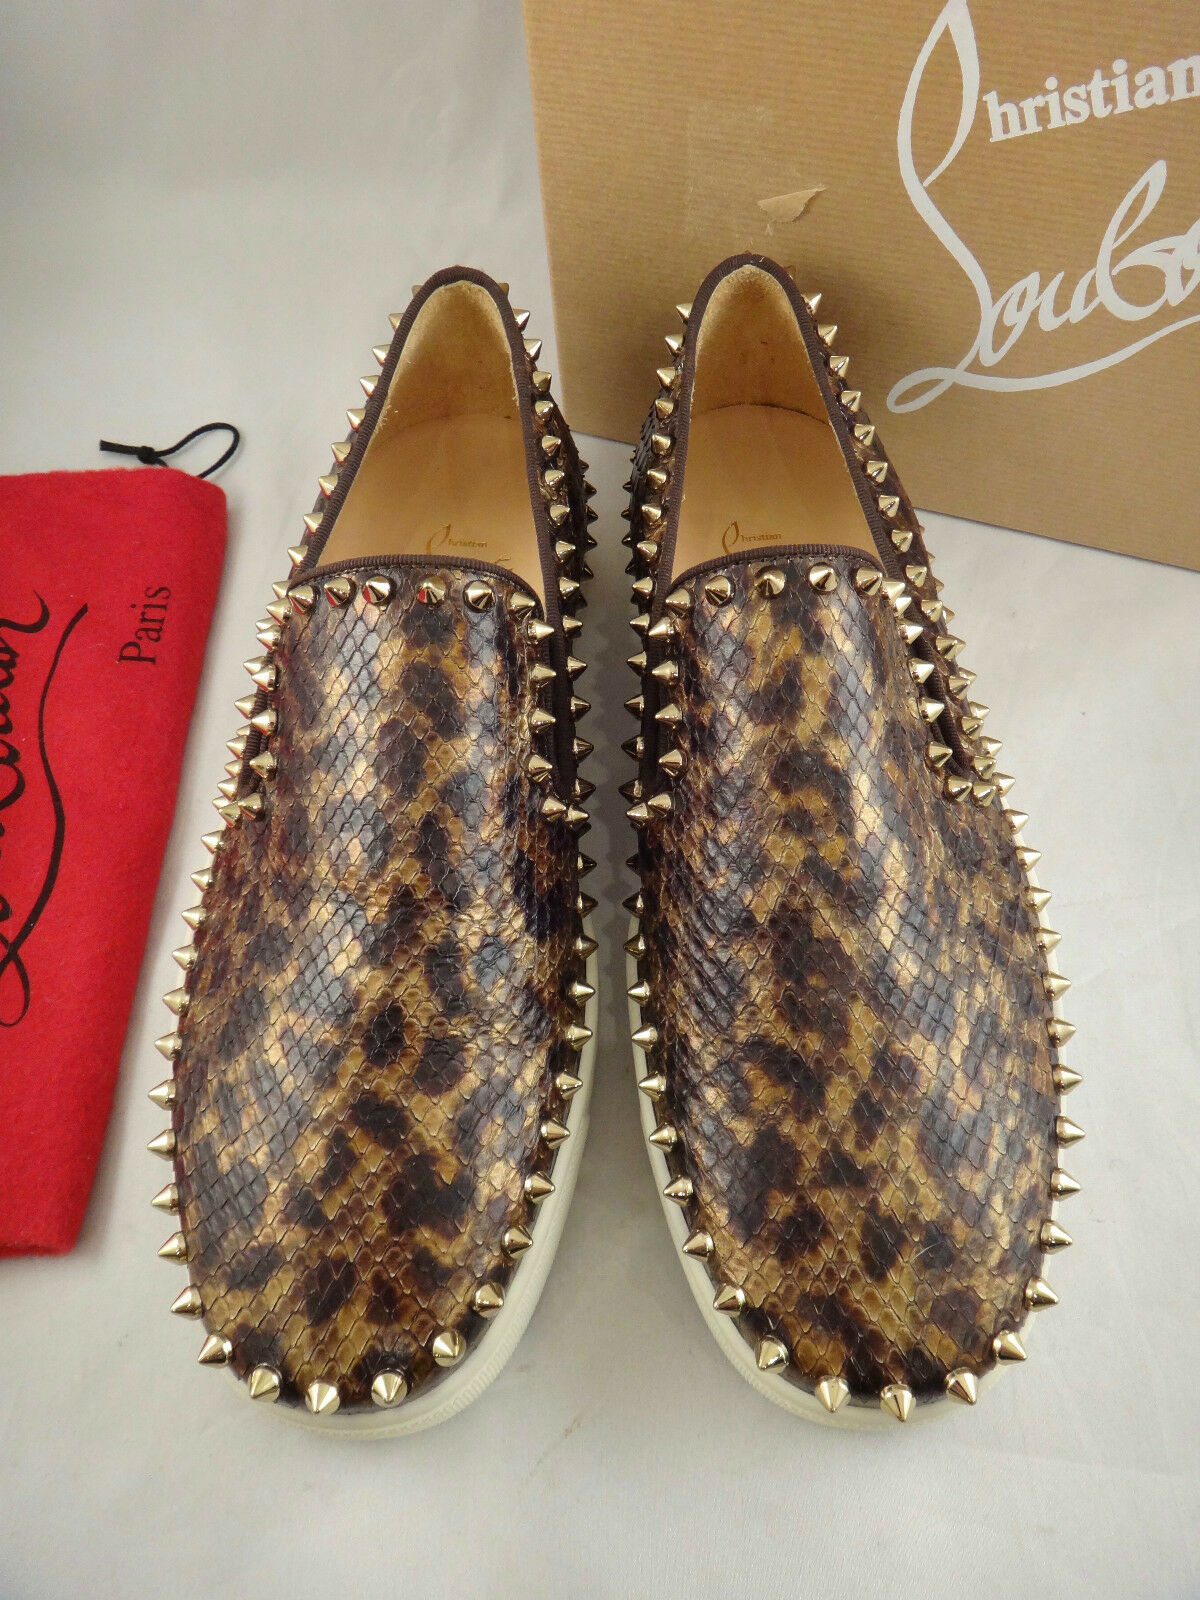 New in Box Christian Louboutin PIK bateau Python Leopard Roller Spike baskets 38 1395